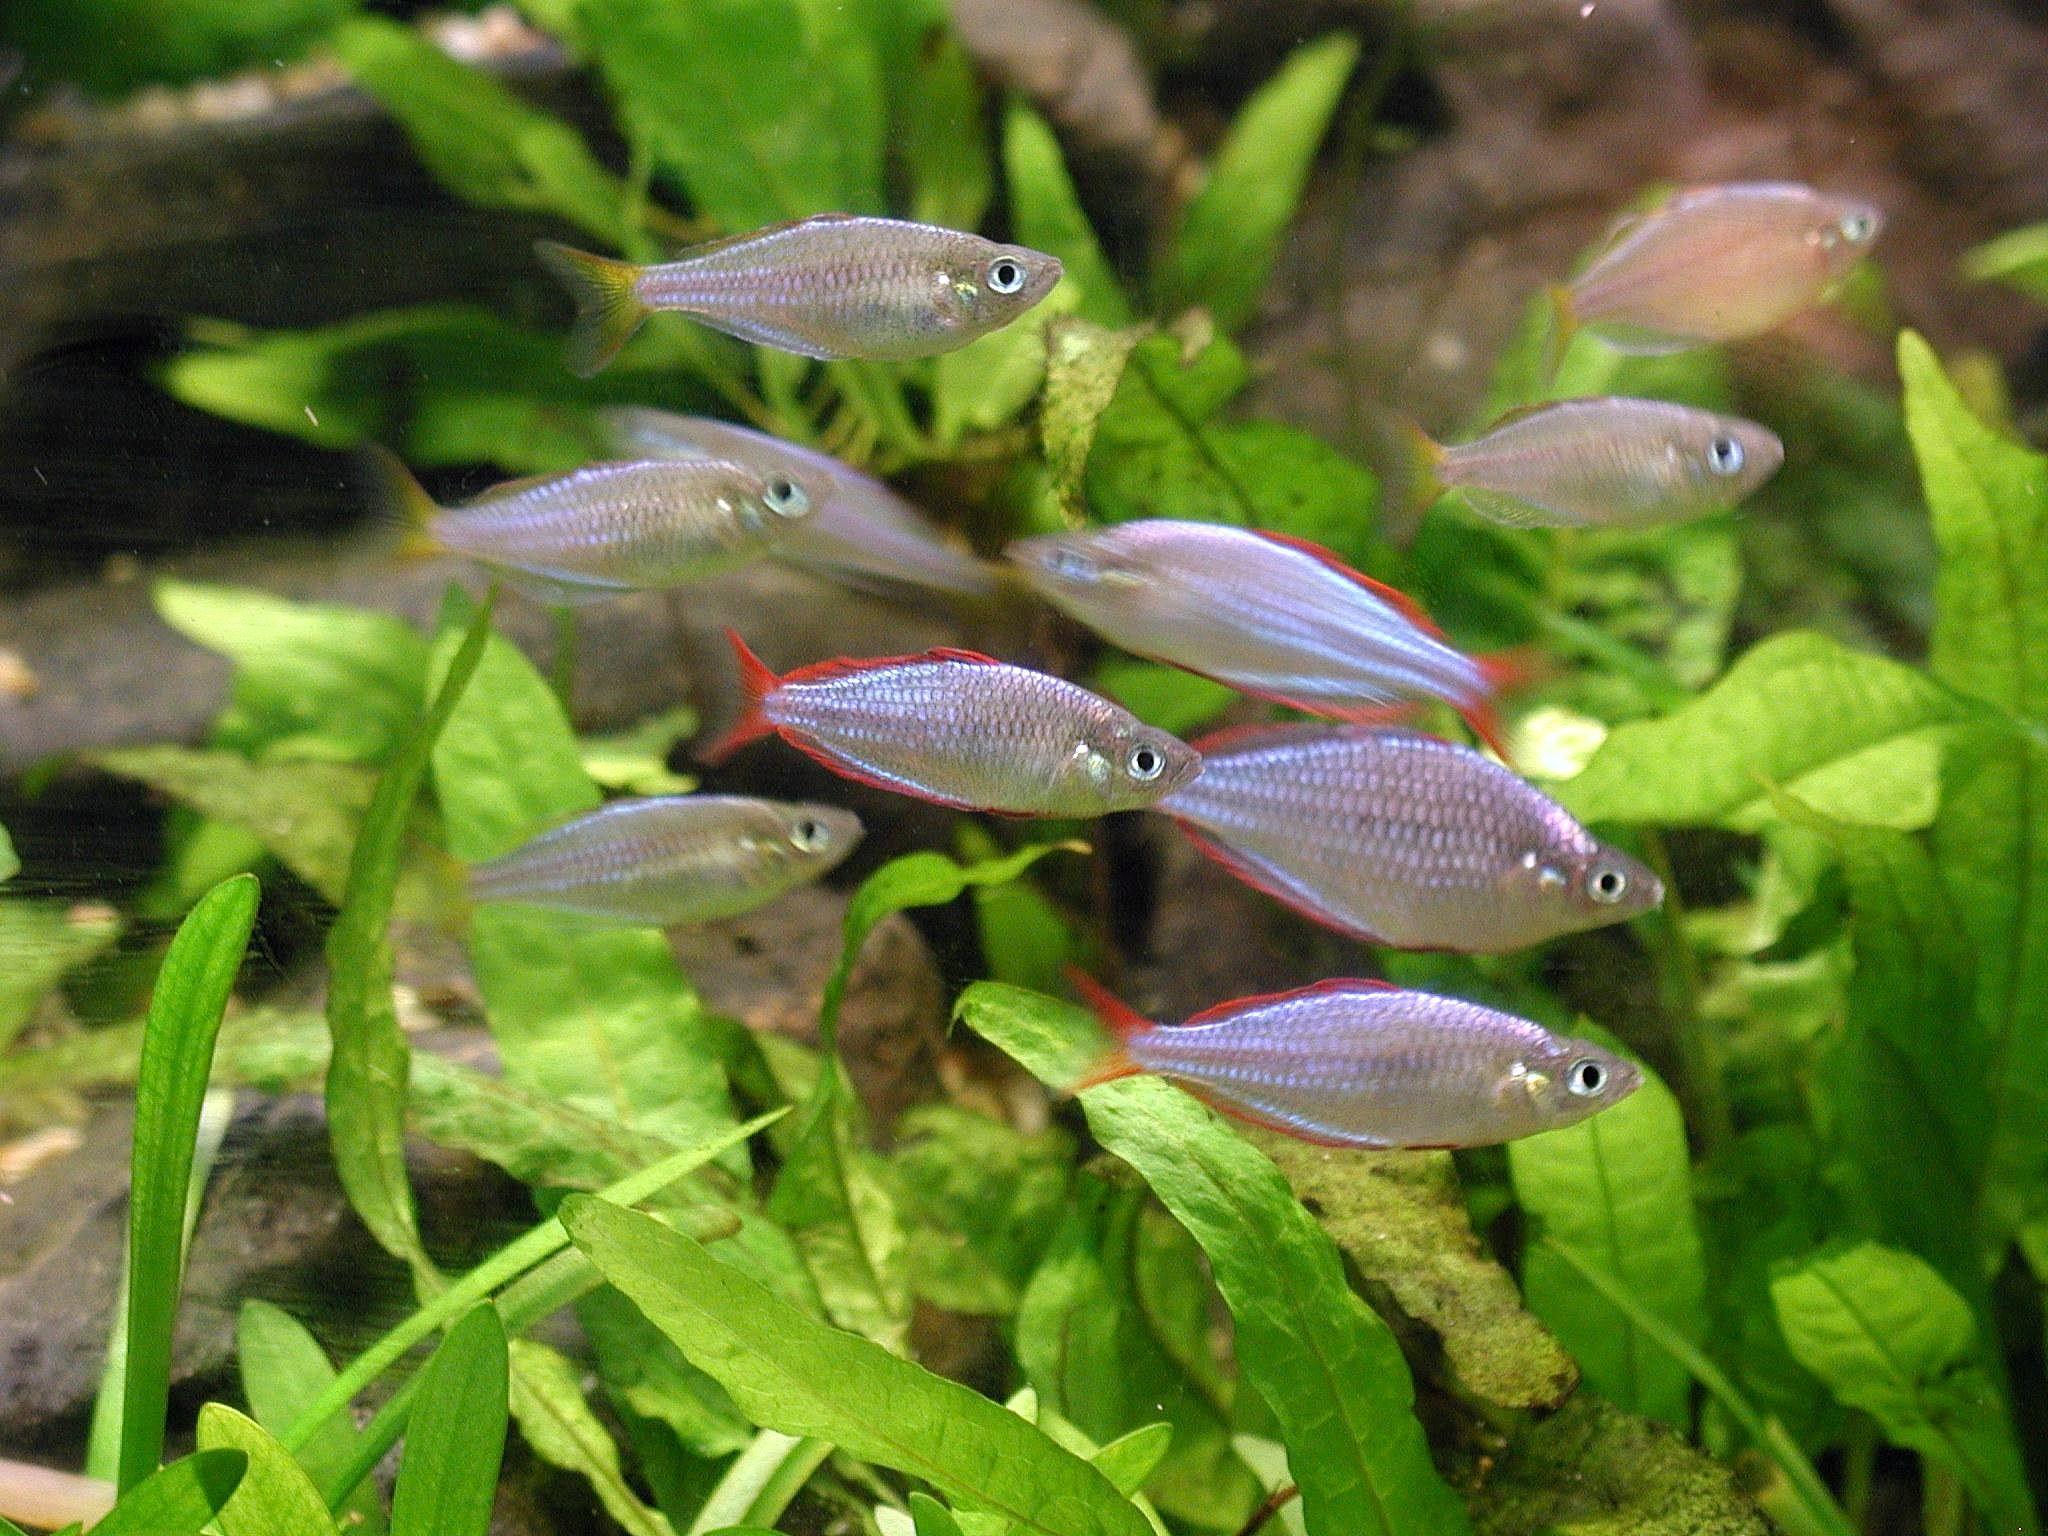 Aquarium Fish Plants File Aquarium Plants And Fish Wikimedia Commons 2017 Fish Tank Maintenance